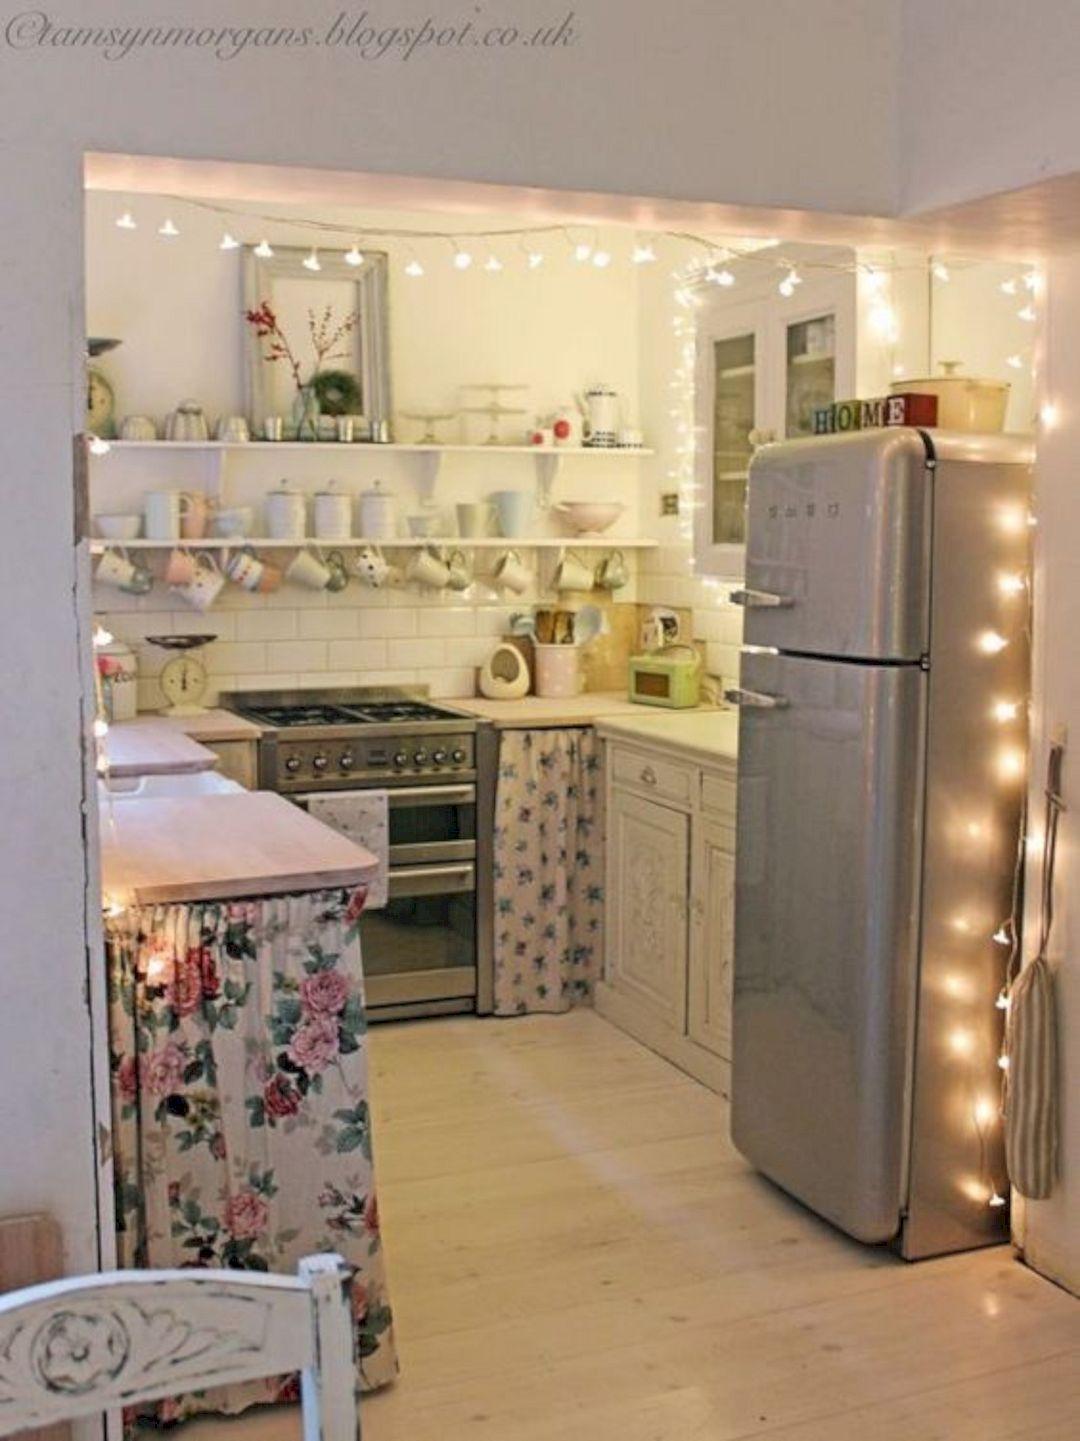 Encantador Ideas De Pintura Crema Gabinete De Cocina Regalo - Como ...